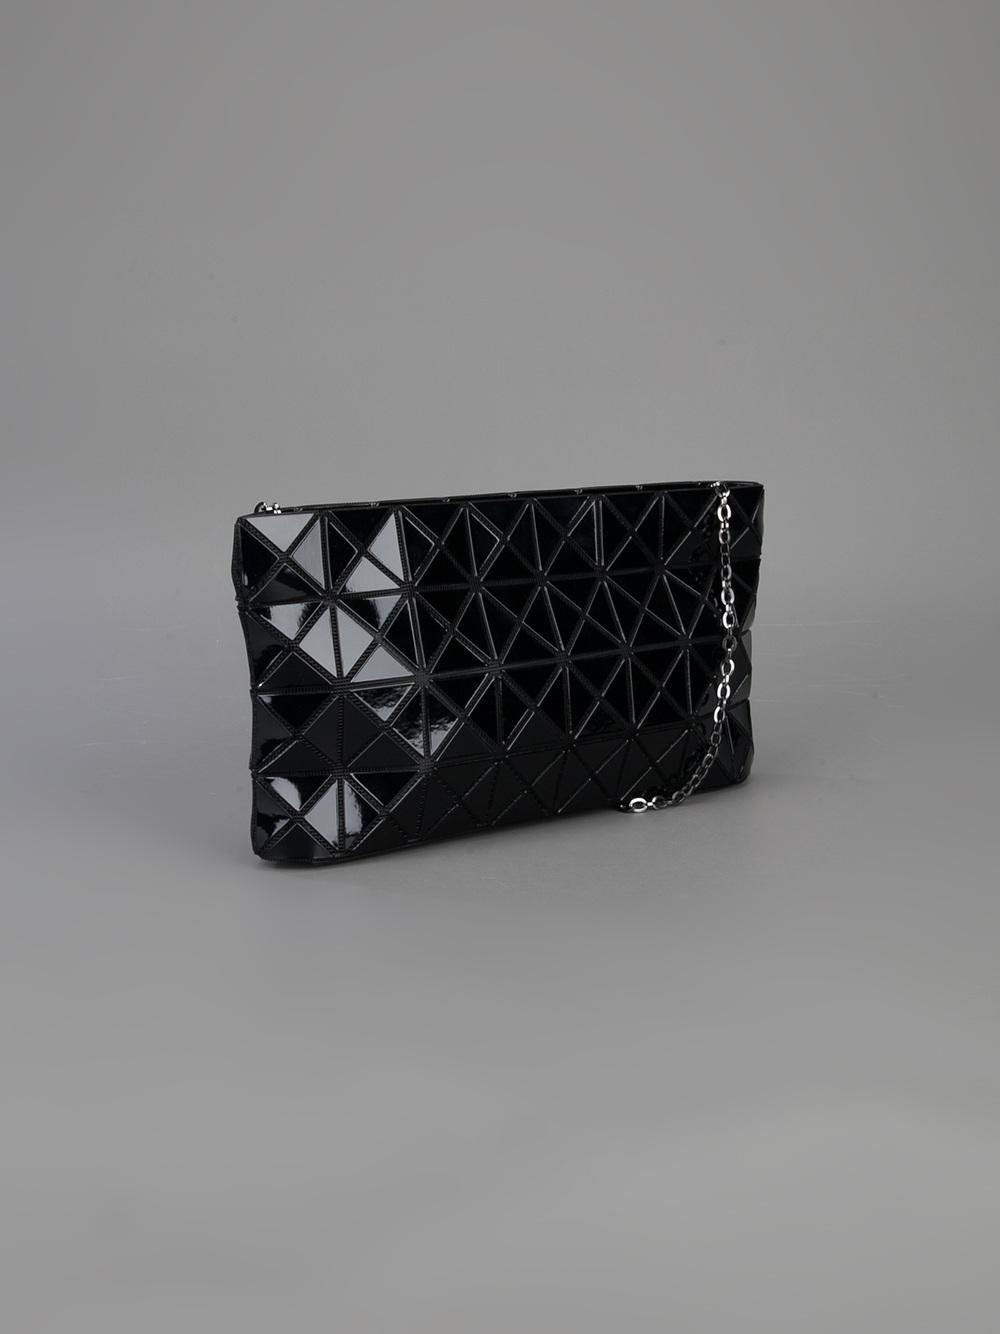 fe196094905 ... Bao Bao Issey Miyake Geometric Clutch Bag in Black - Lyst online store  70ffb 0d74a ...